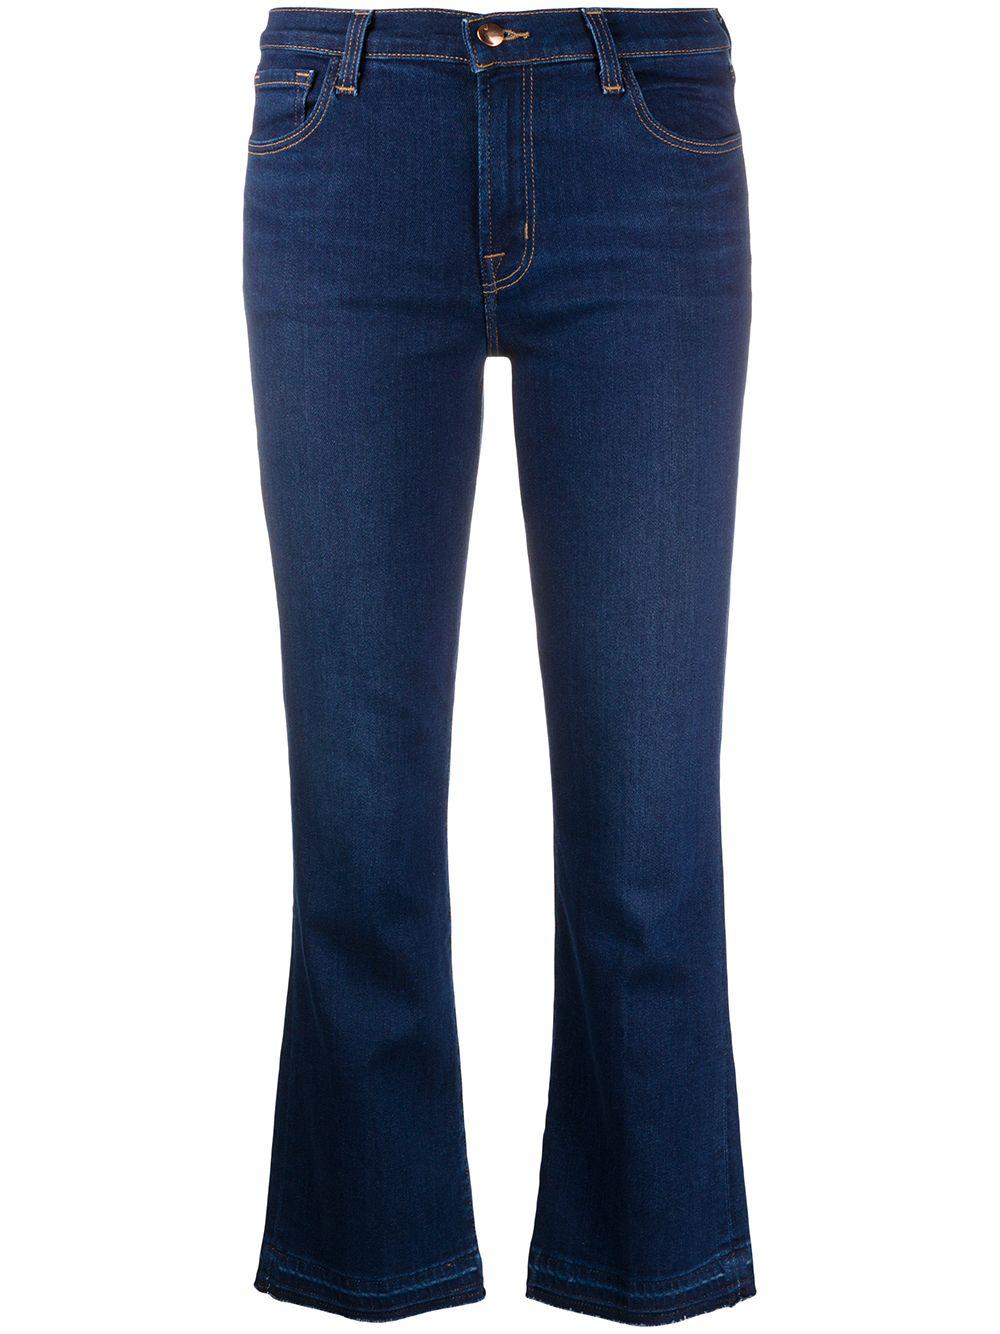 Selena Denim Jeans